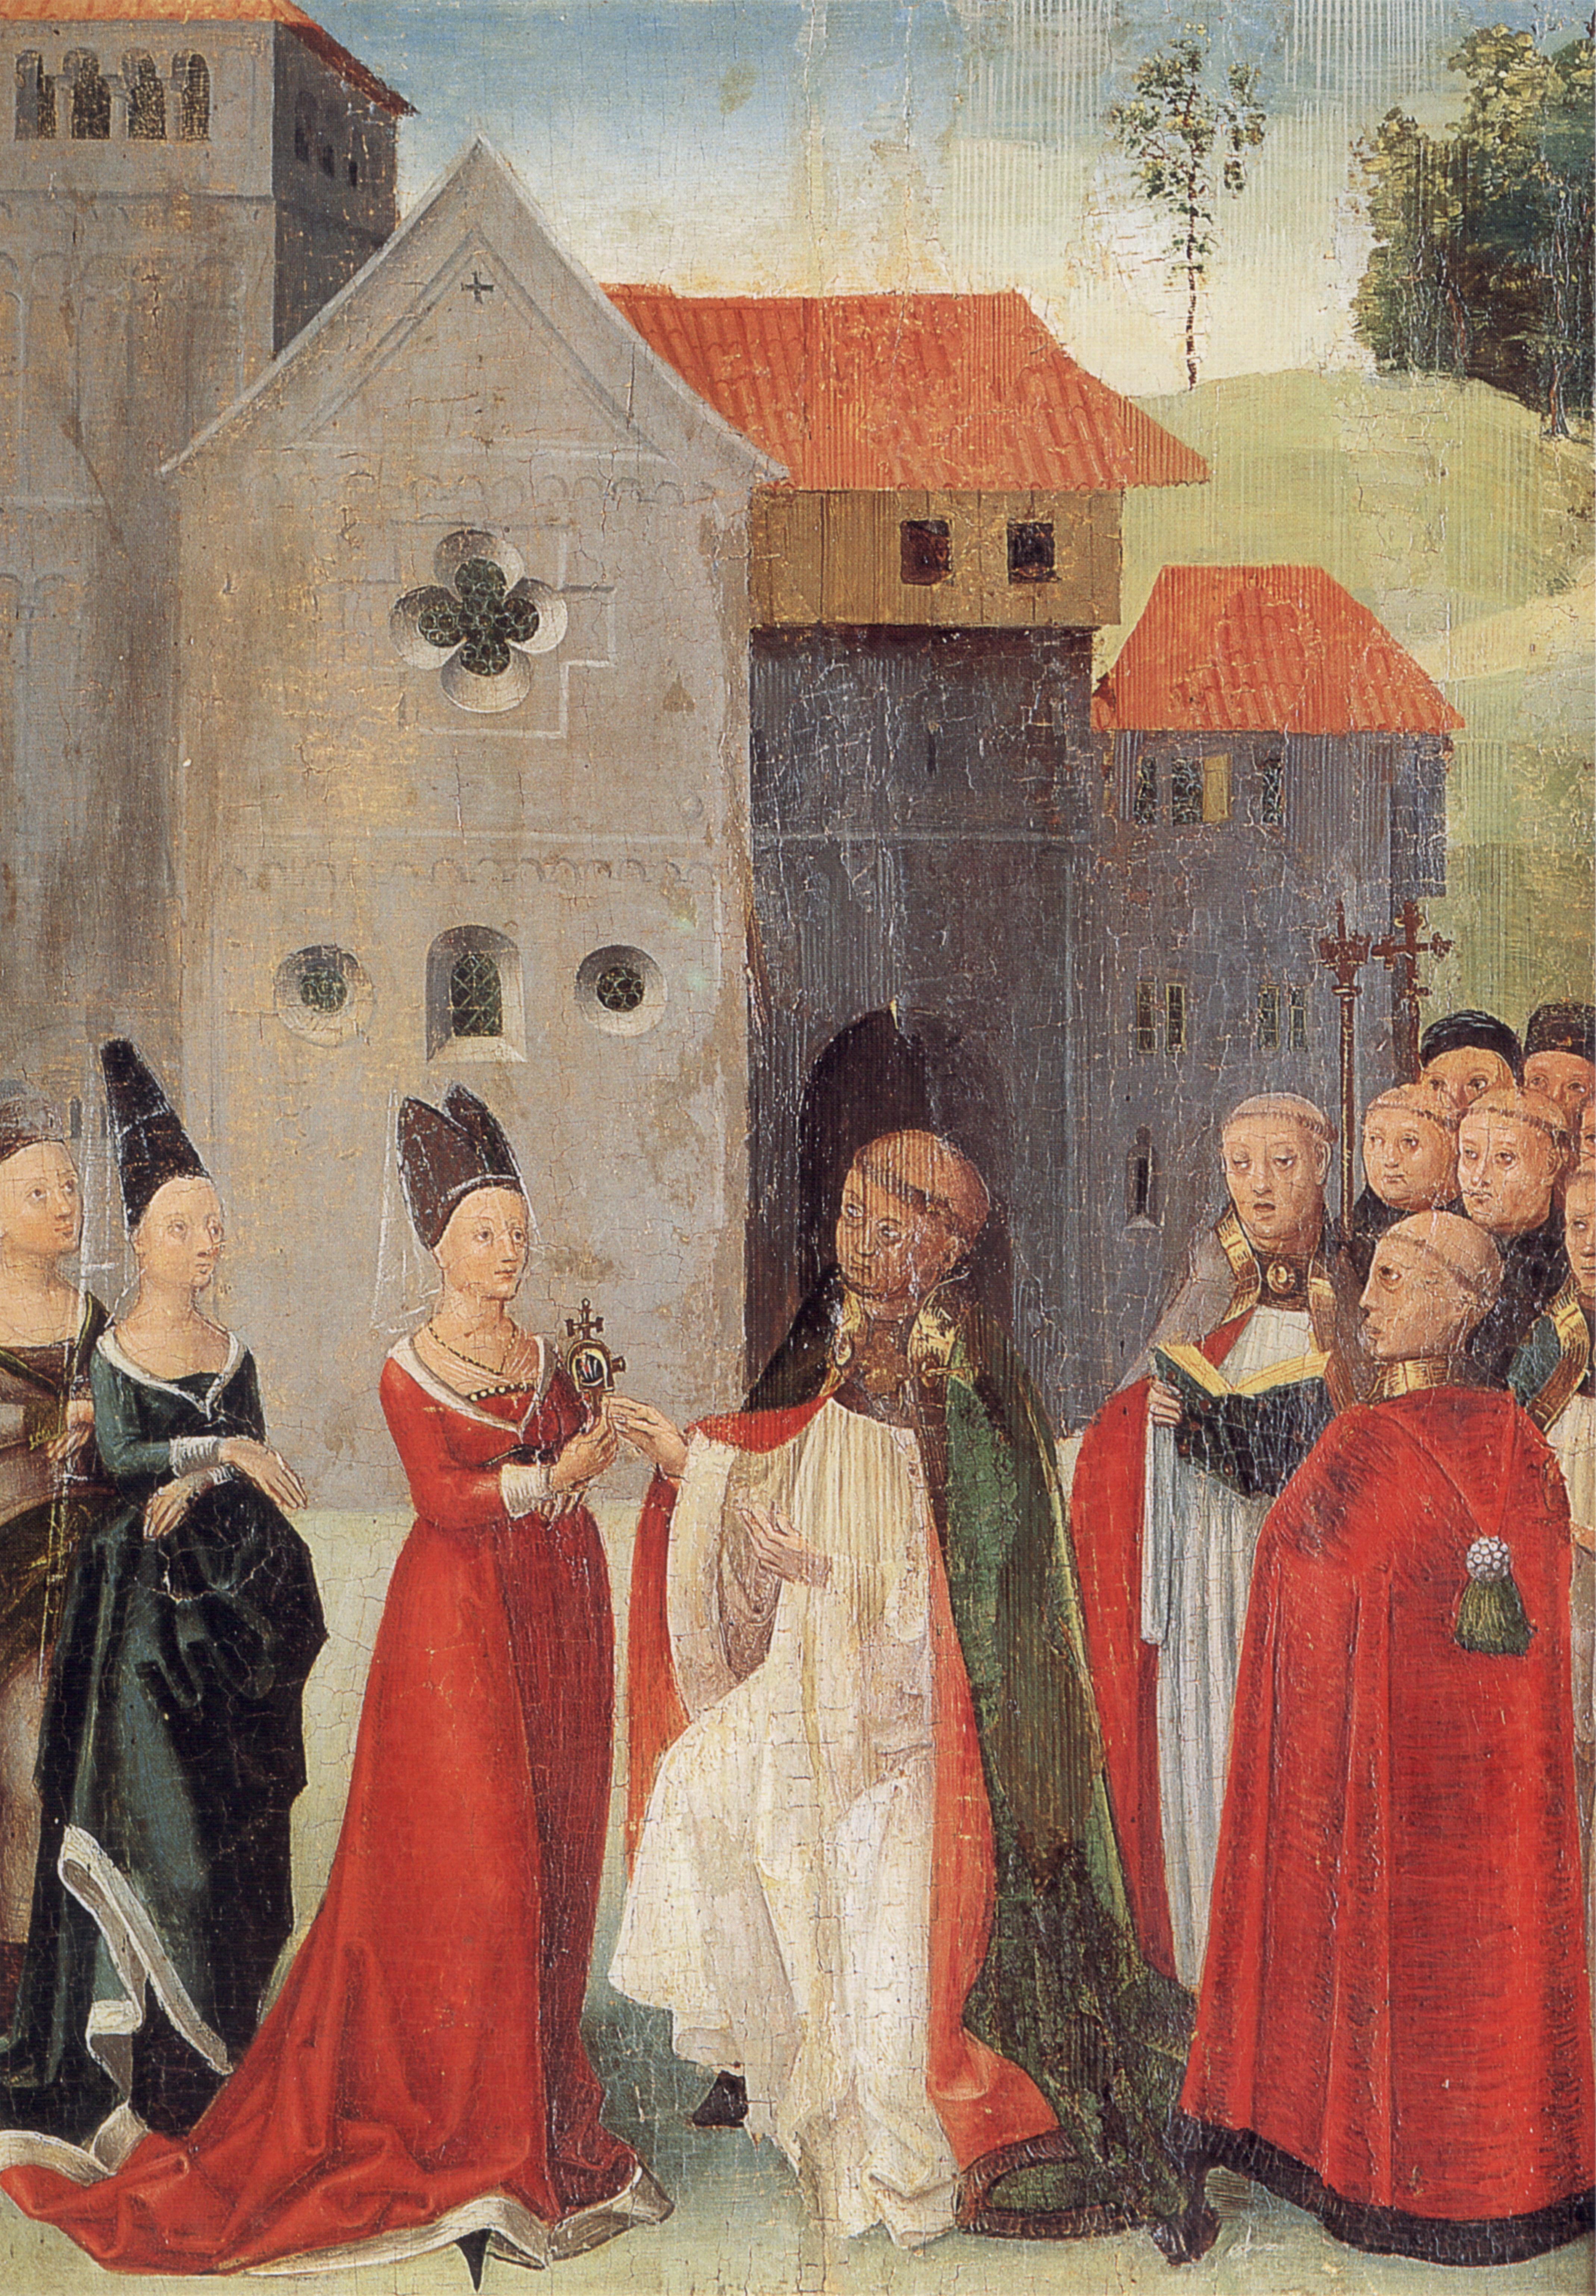 File:Heilig-Blut-Tafel Weingarten 1489 img24.jpg